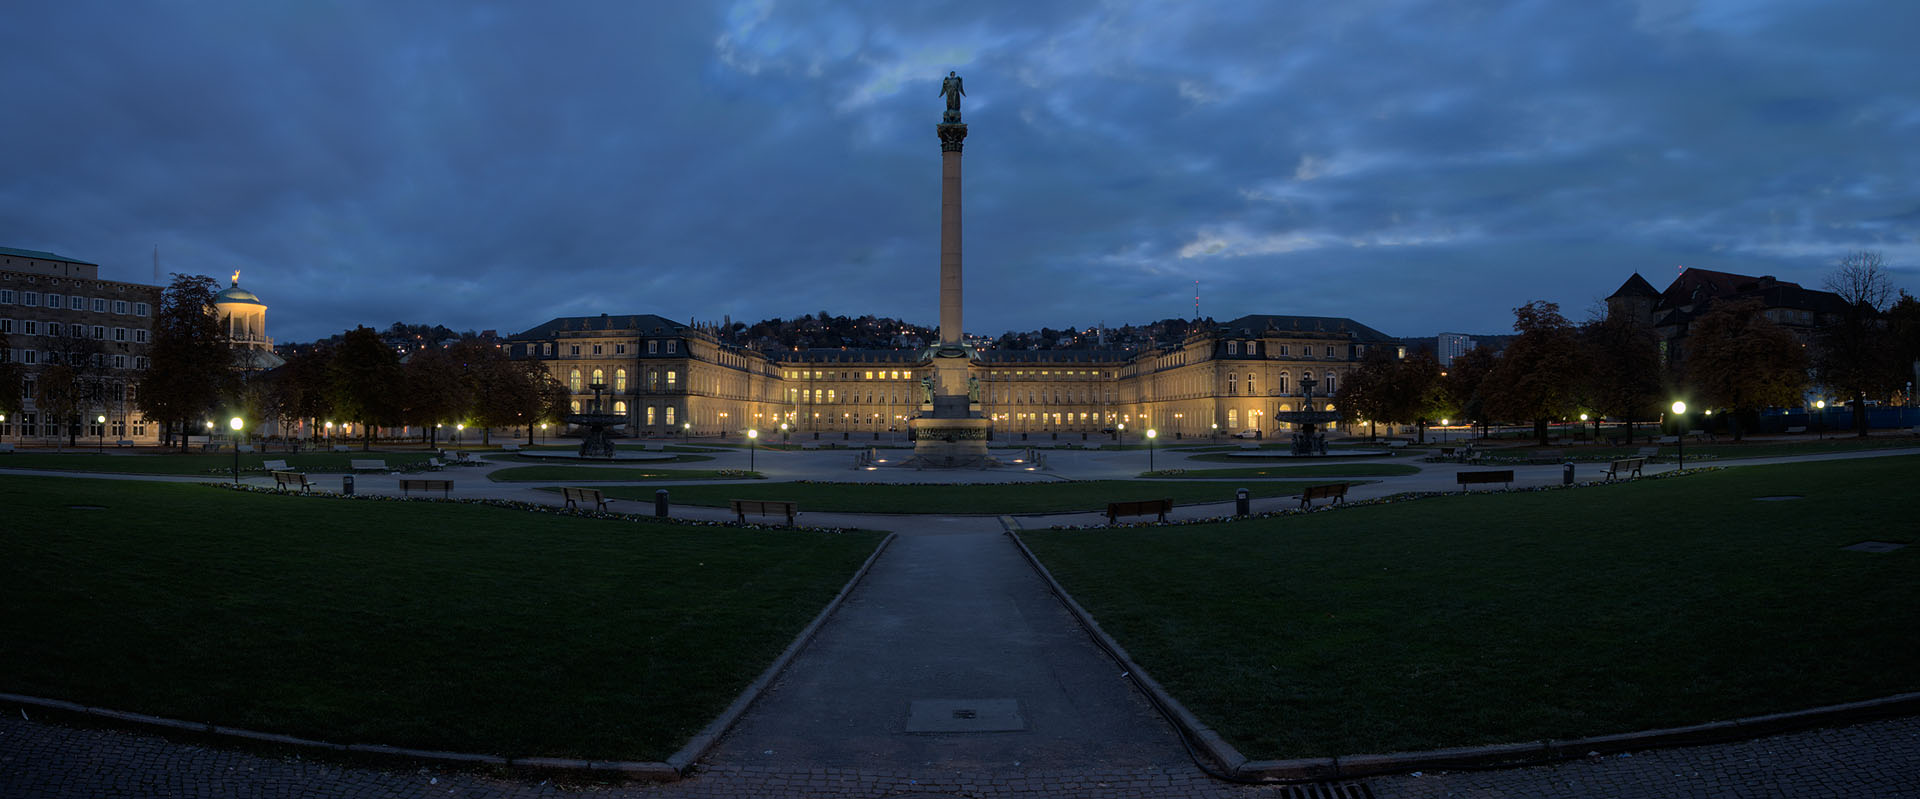 Schlossplatz am Morgen